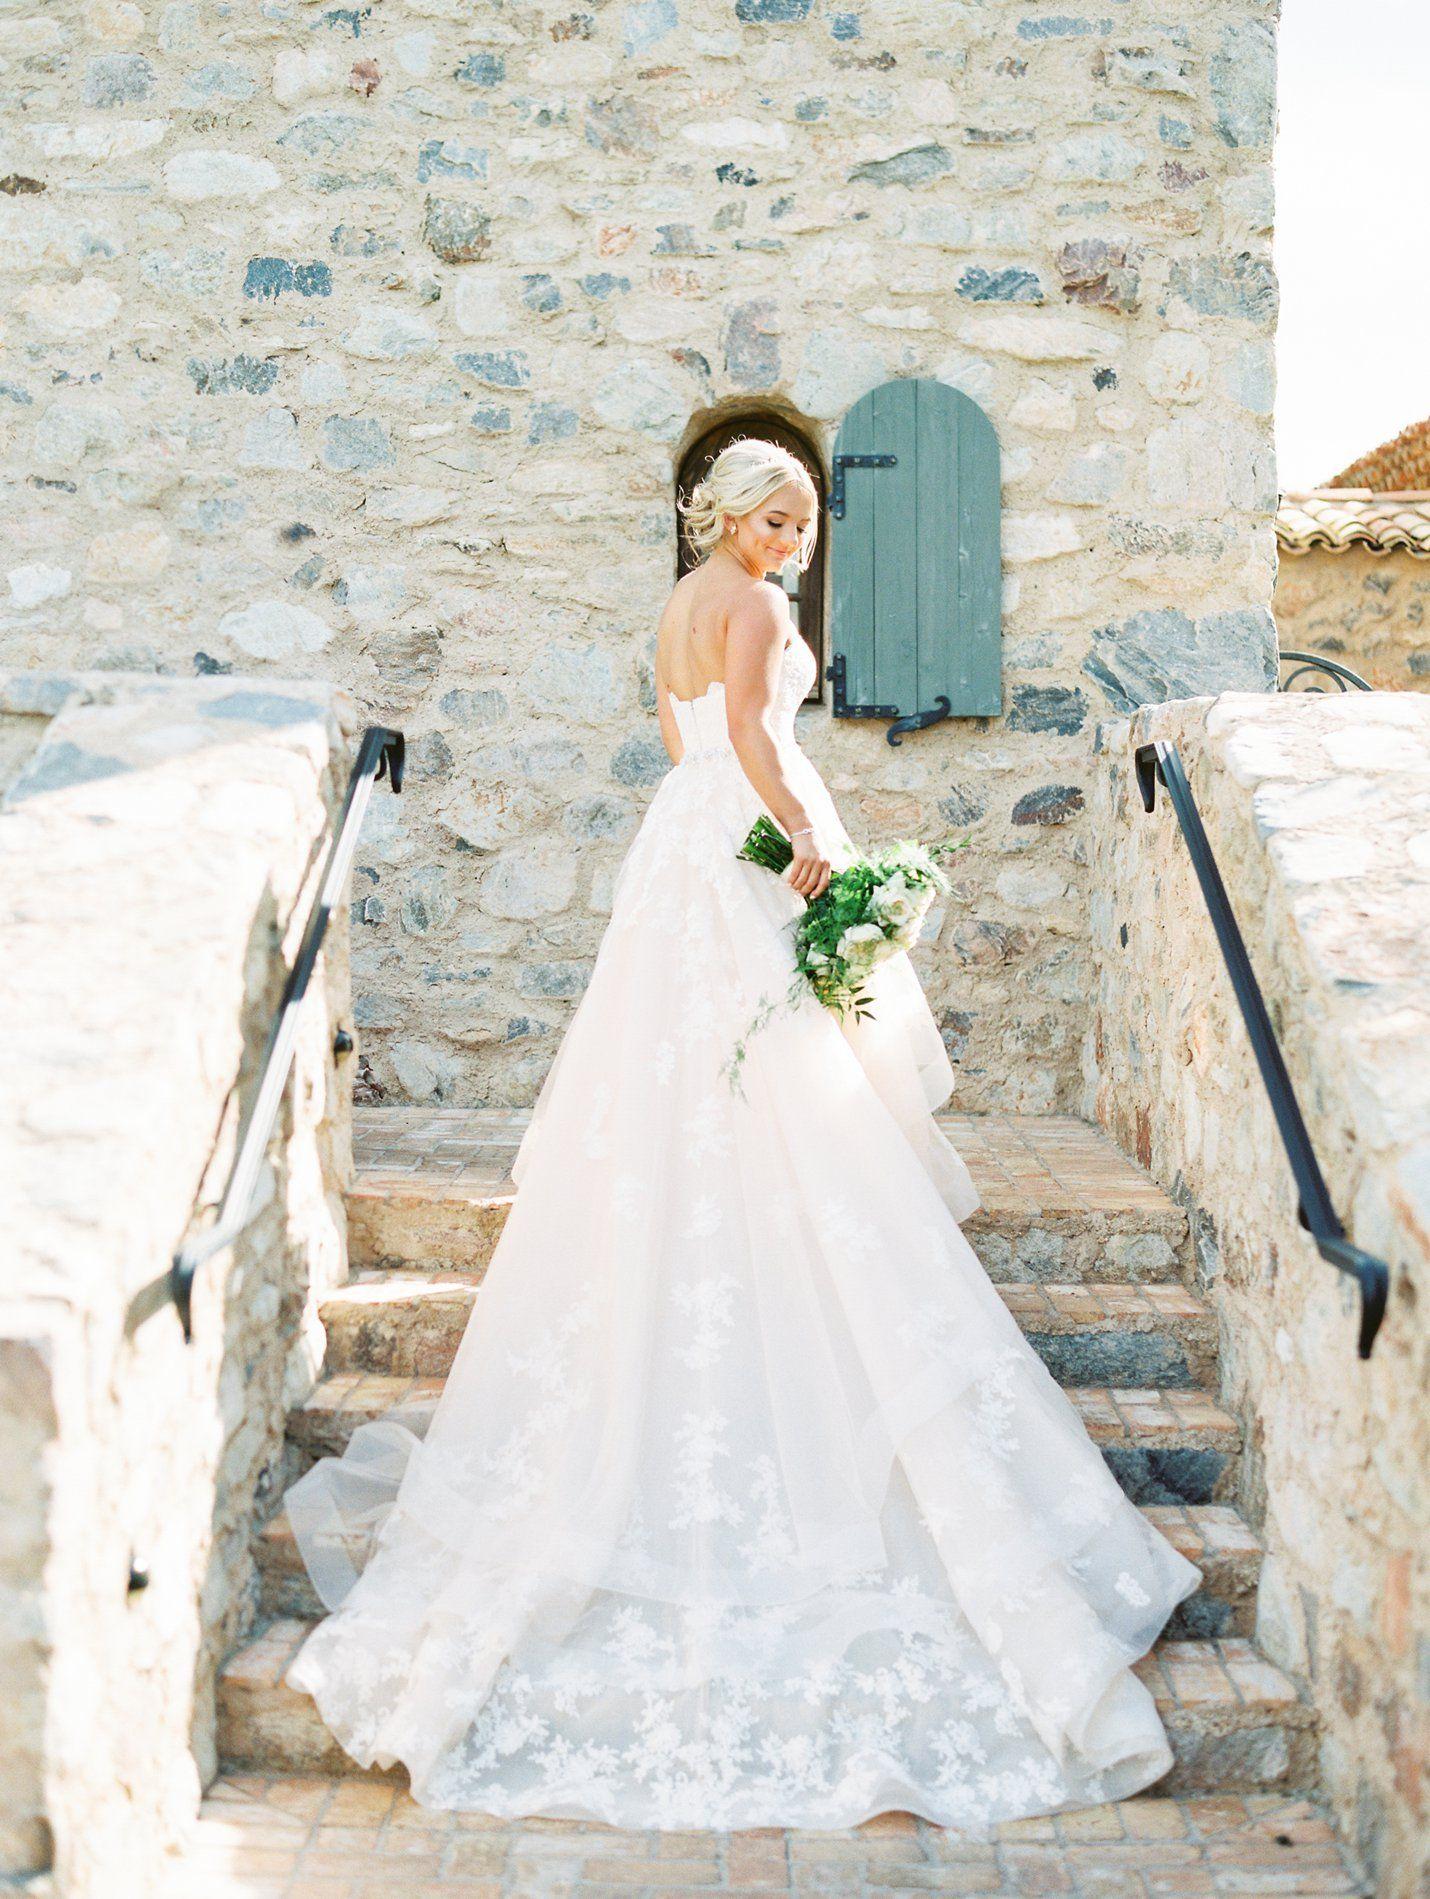 blogs para bodas, rachel solomon boda fotografia blog